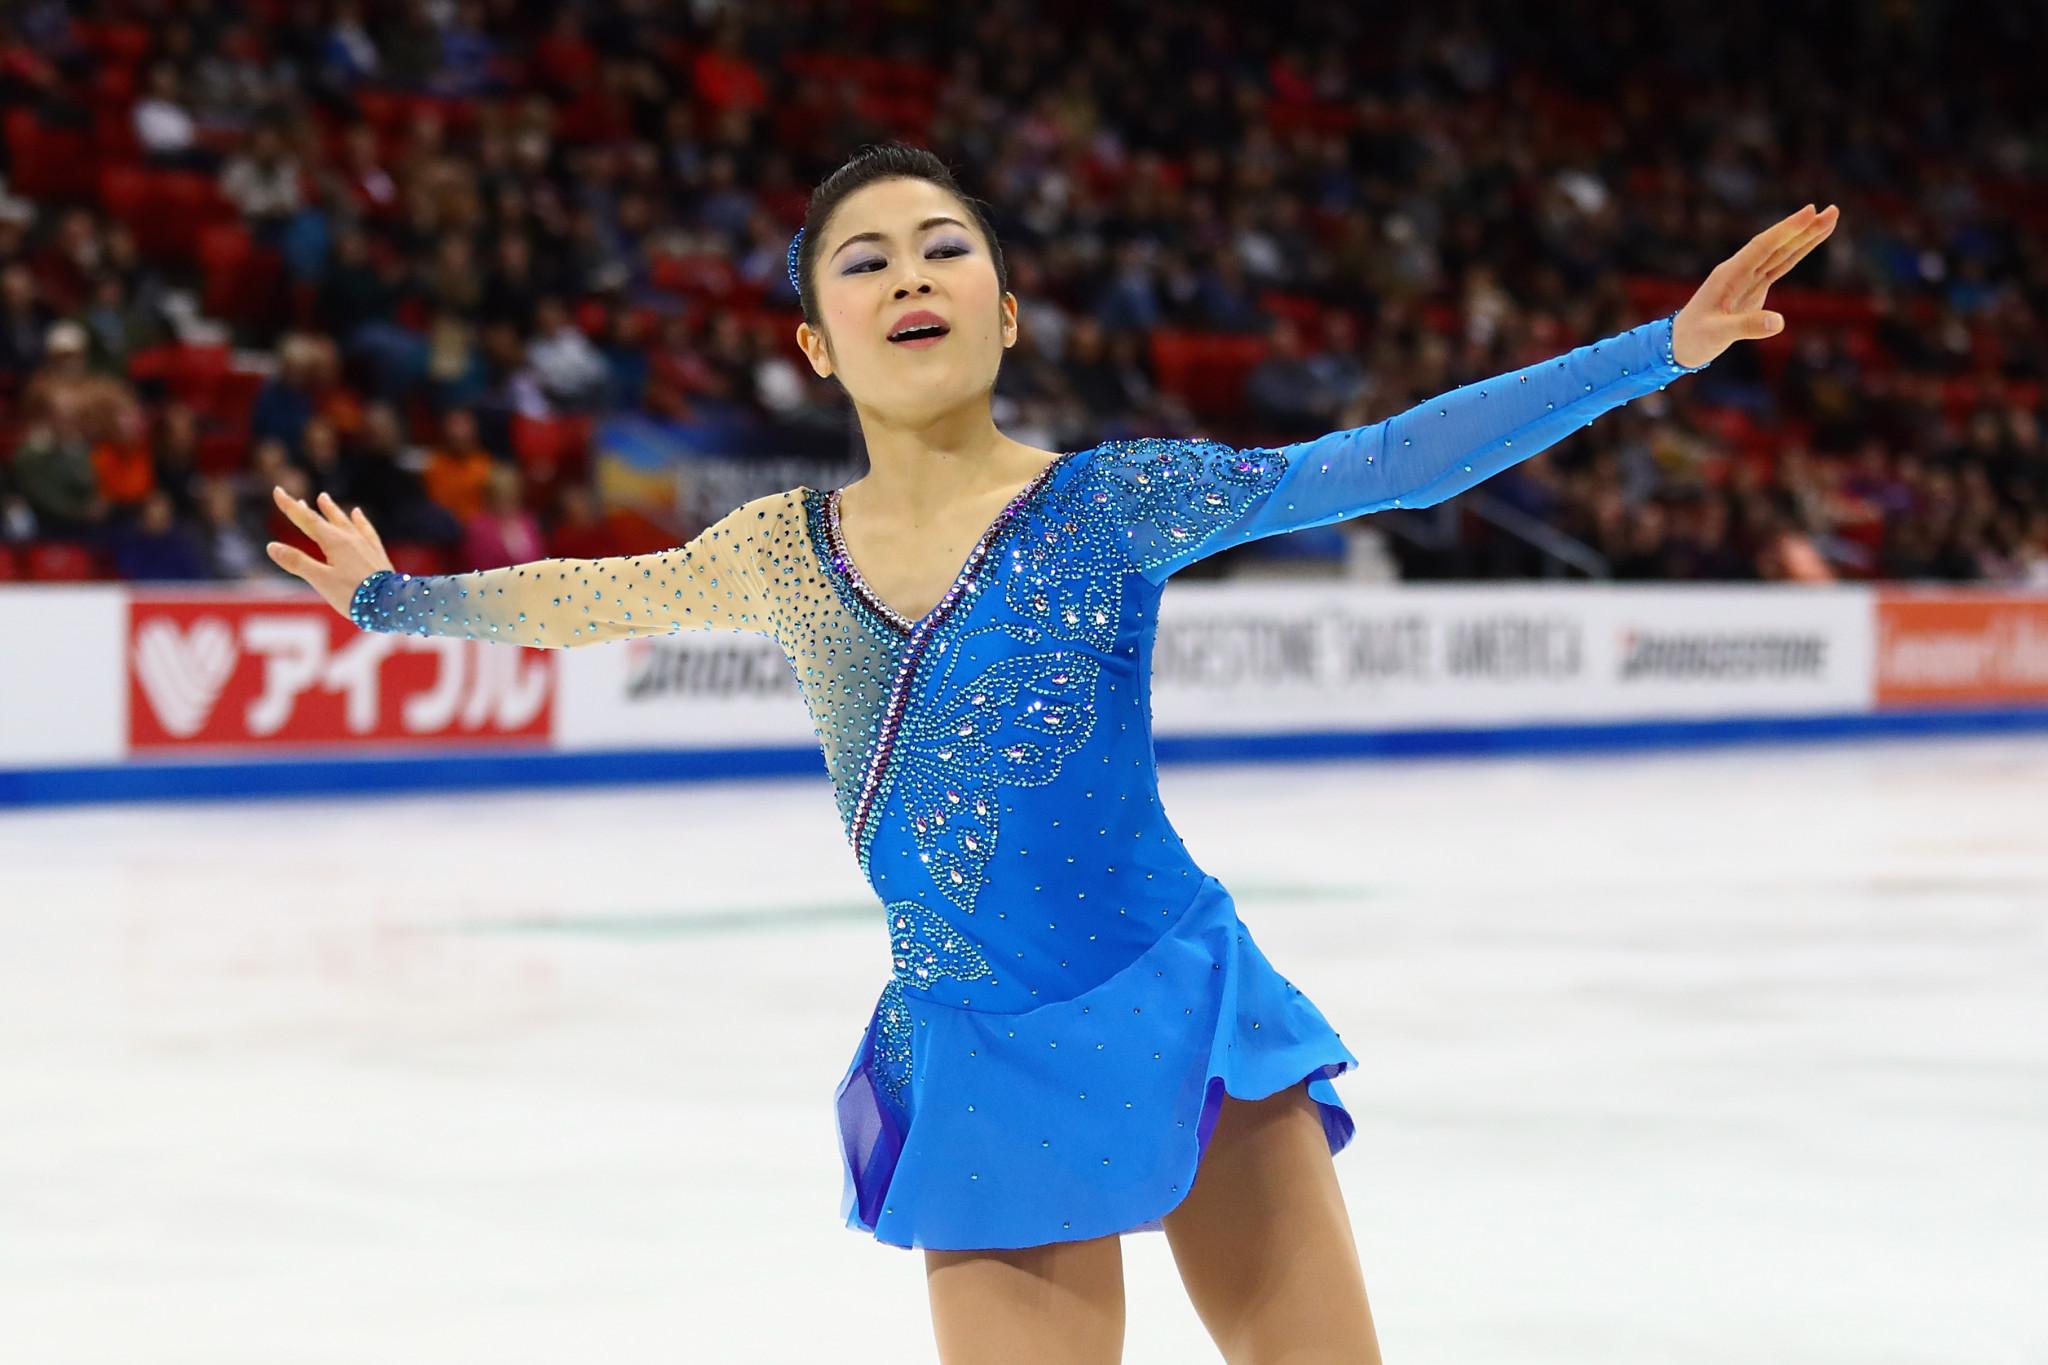 Japan's Miyahara clinches women's title at Skate America